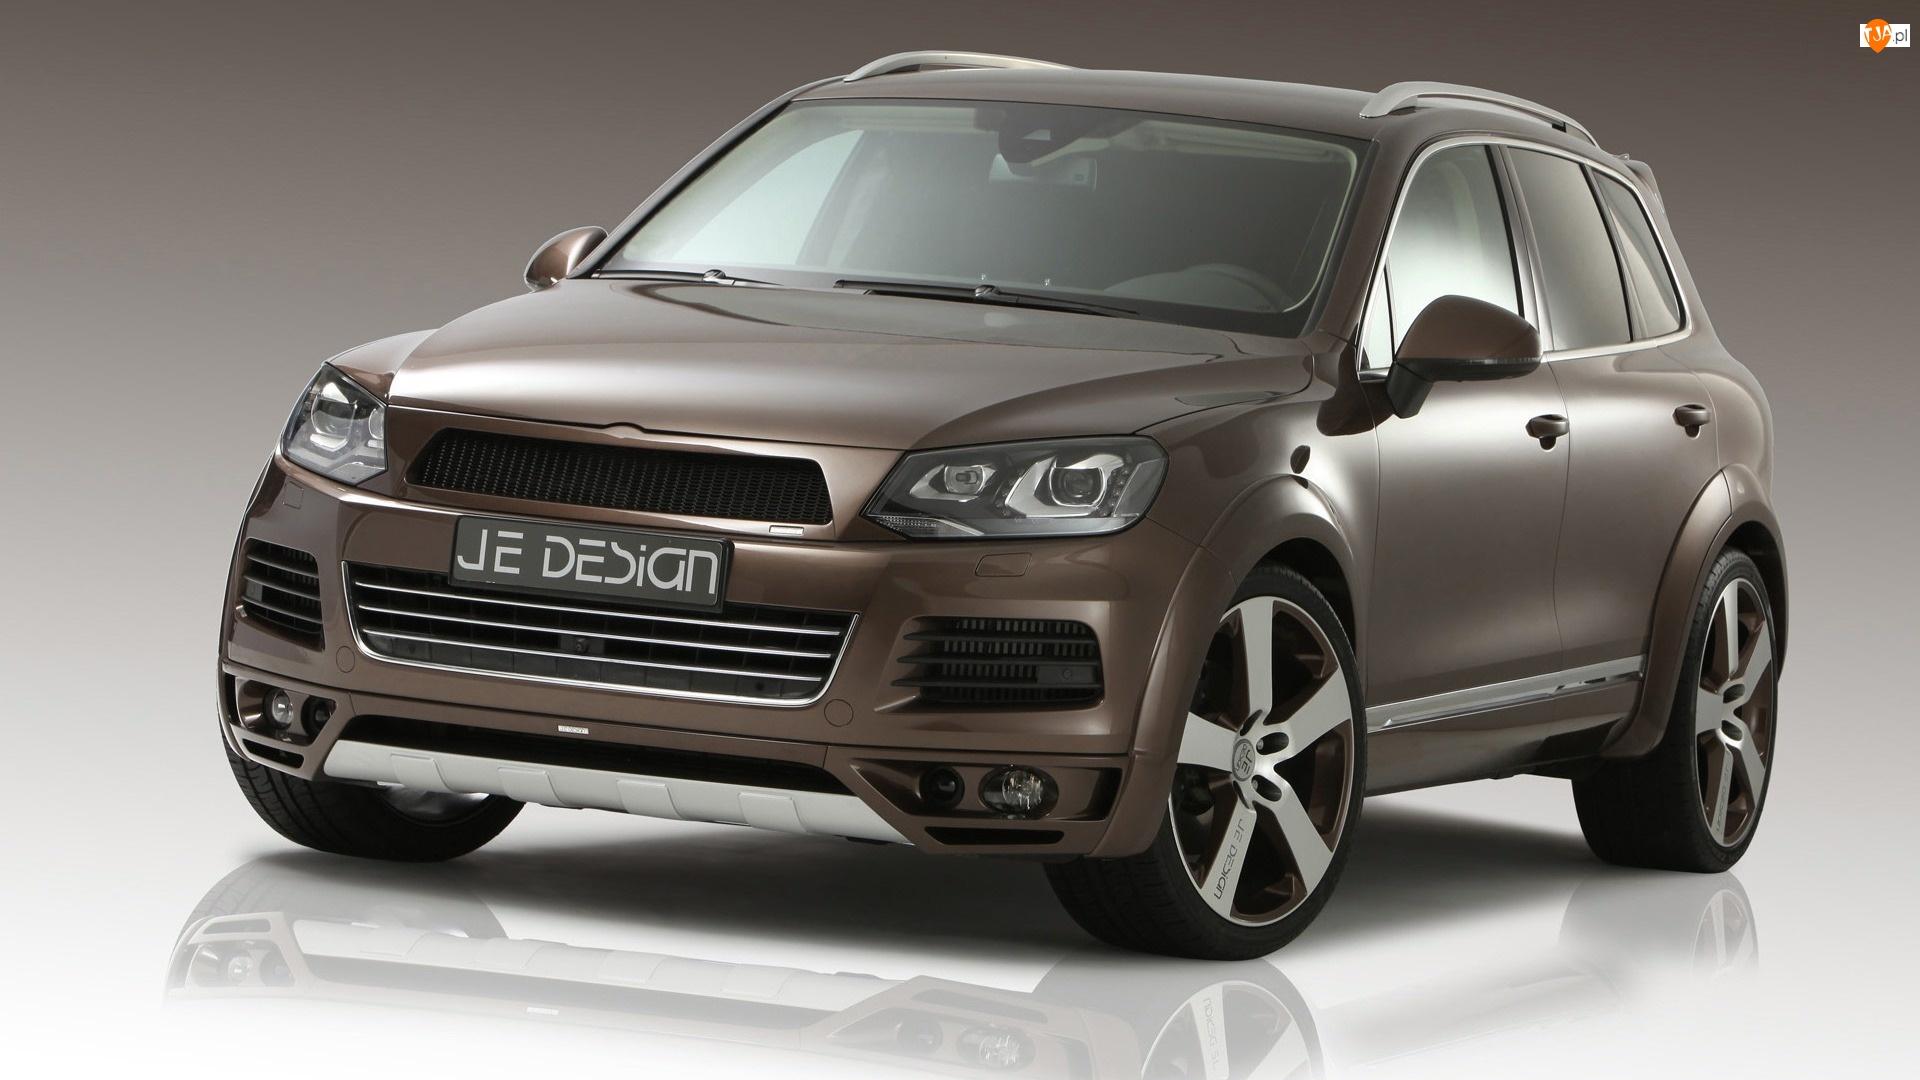 Volkswagen Touareg, JE Design